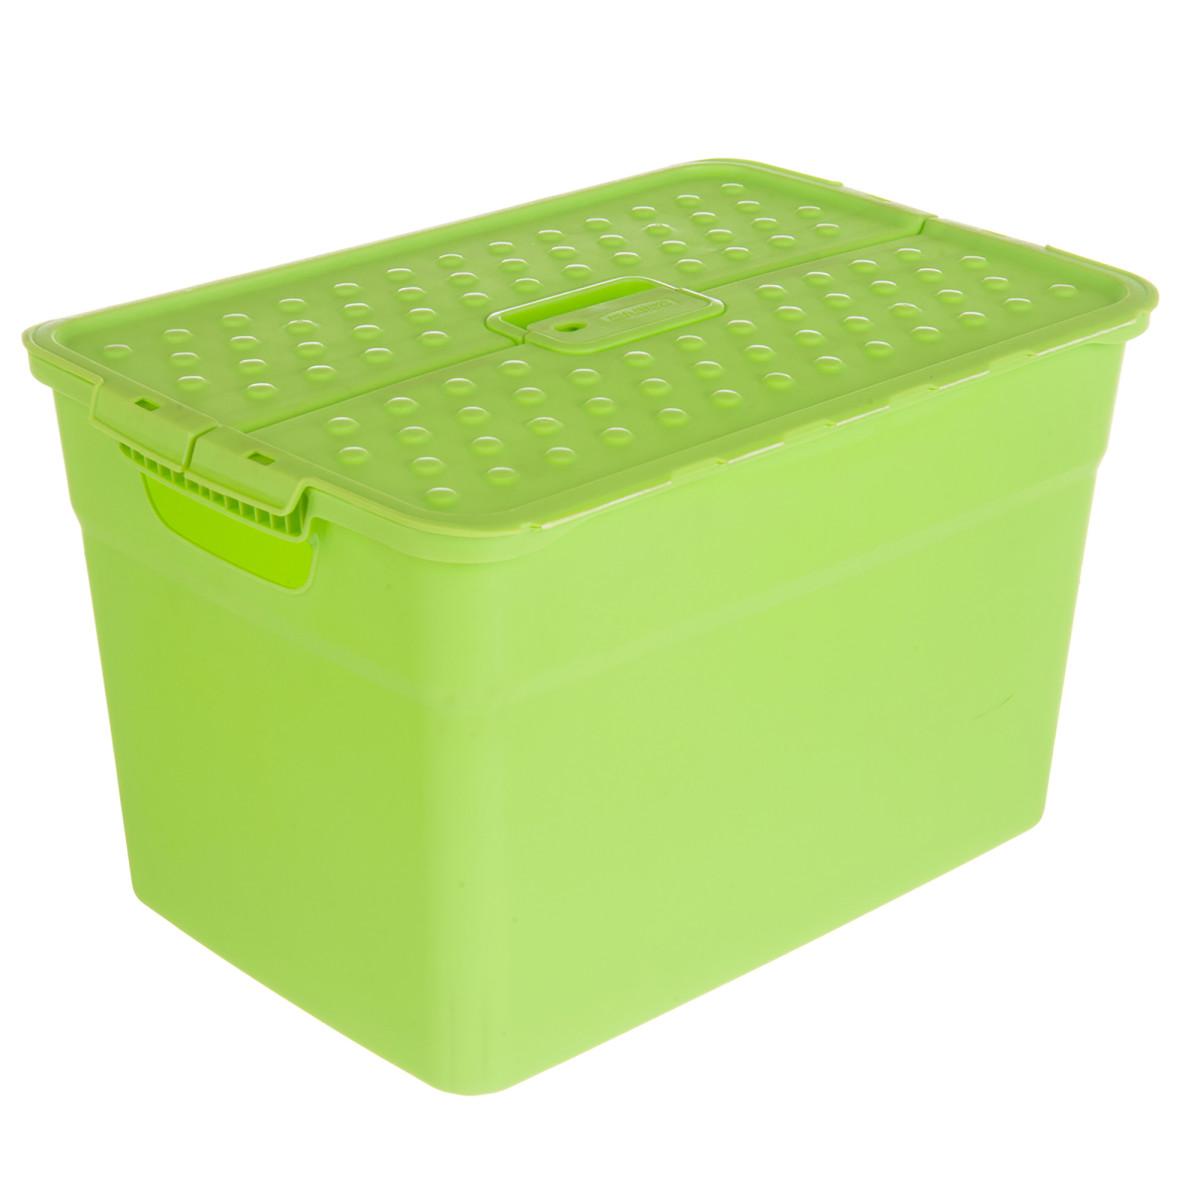 Контейнер Curver Pixxel 12 л пластик цвет зеленый